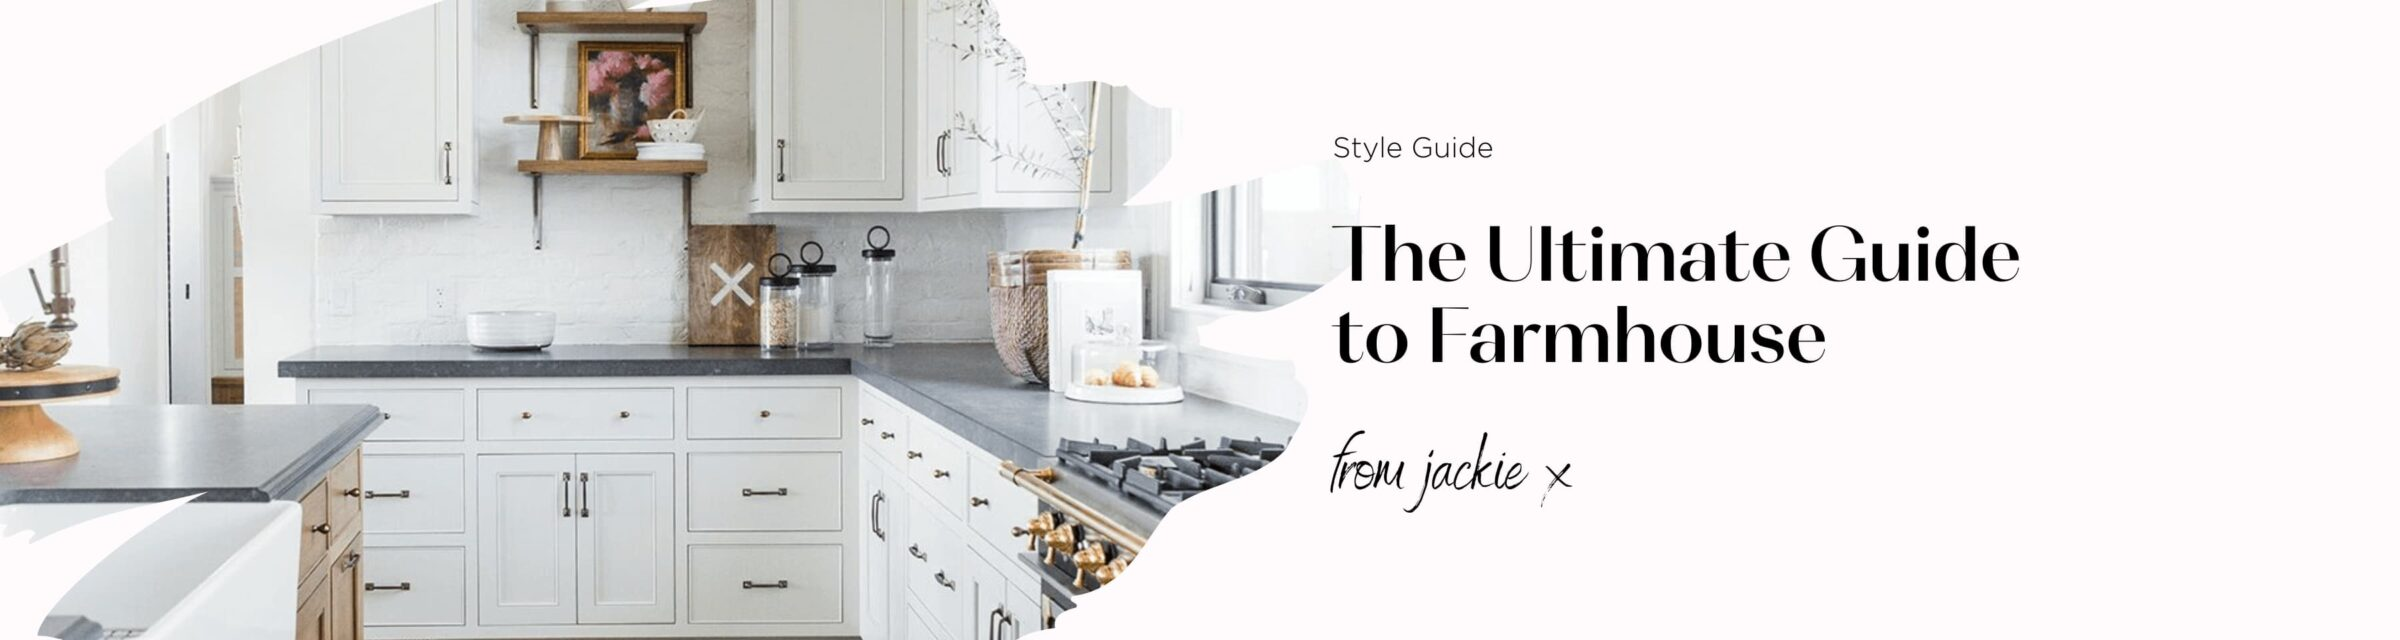 farmhouse Guide Ad